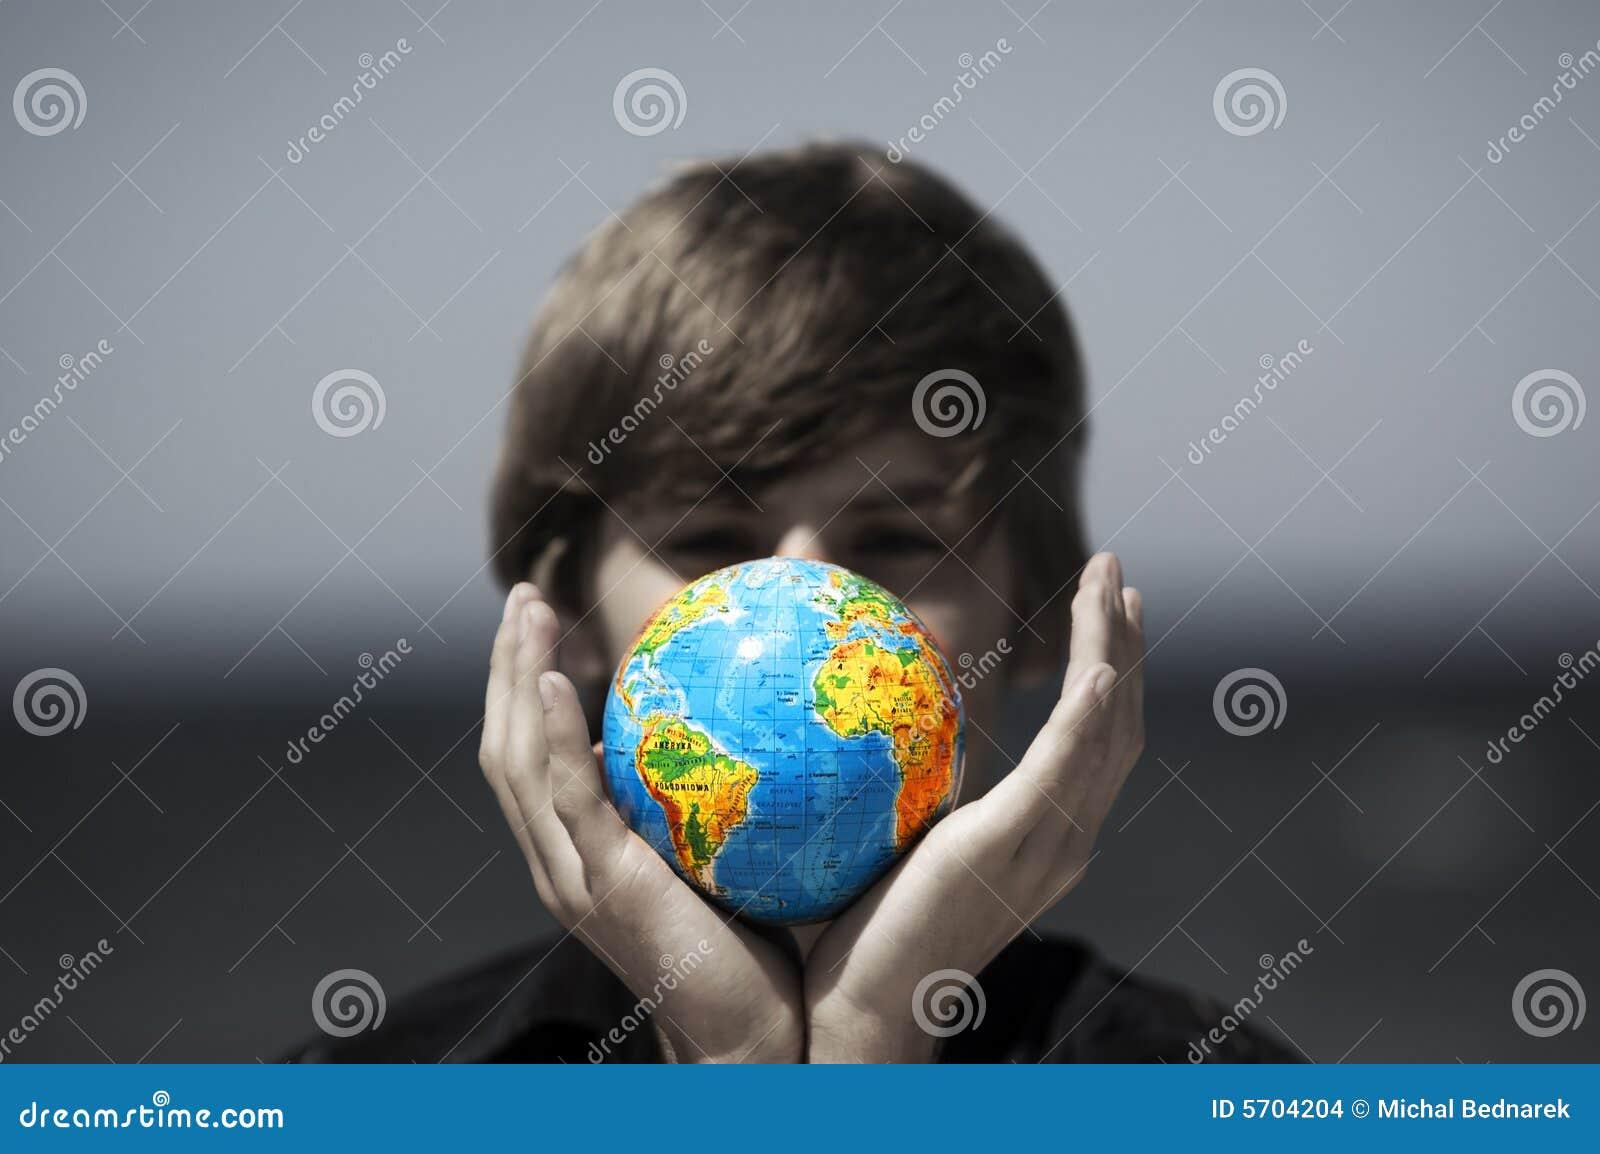 Erdekugel in den Händen. Begriffsbild